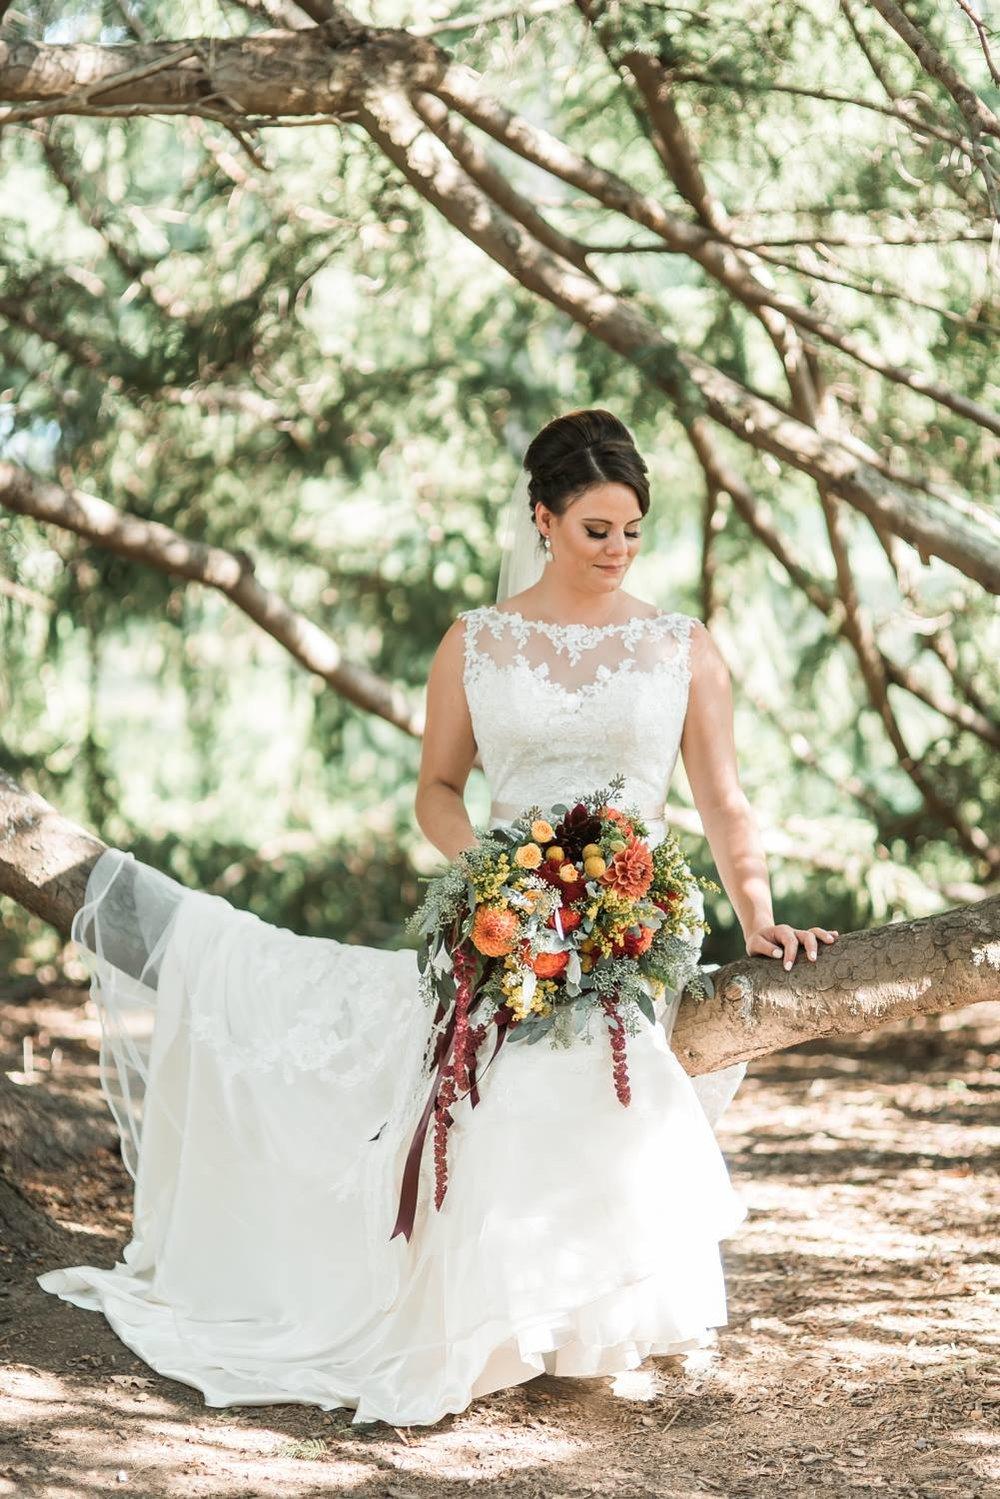 succop-conservancy-pennsylvania-outdoor-glam-jewel-tone-fall-autumn-wedding-0021.jpg